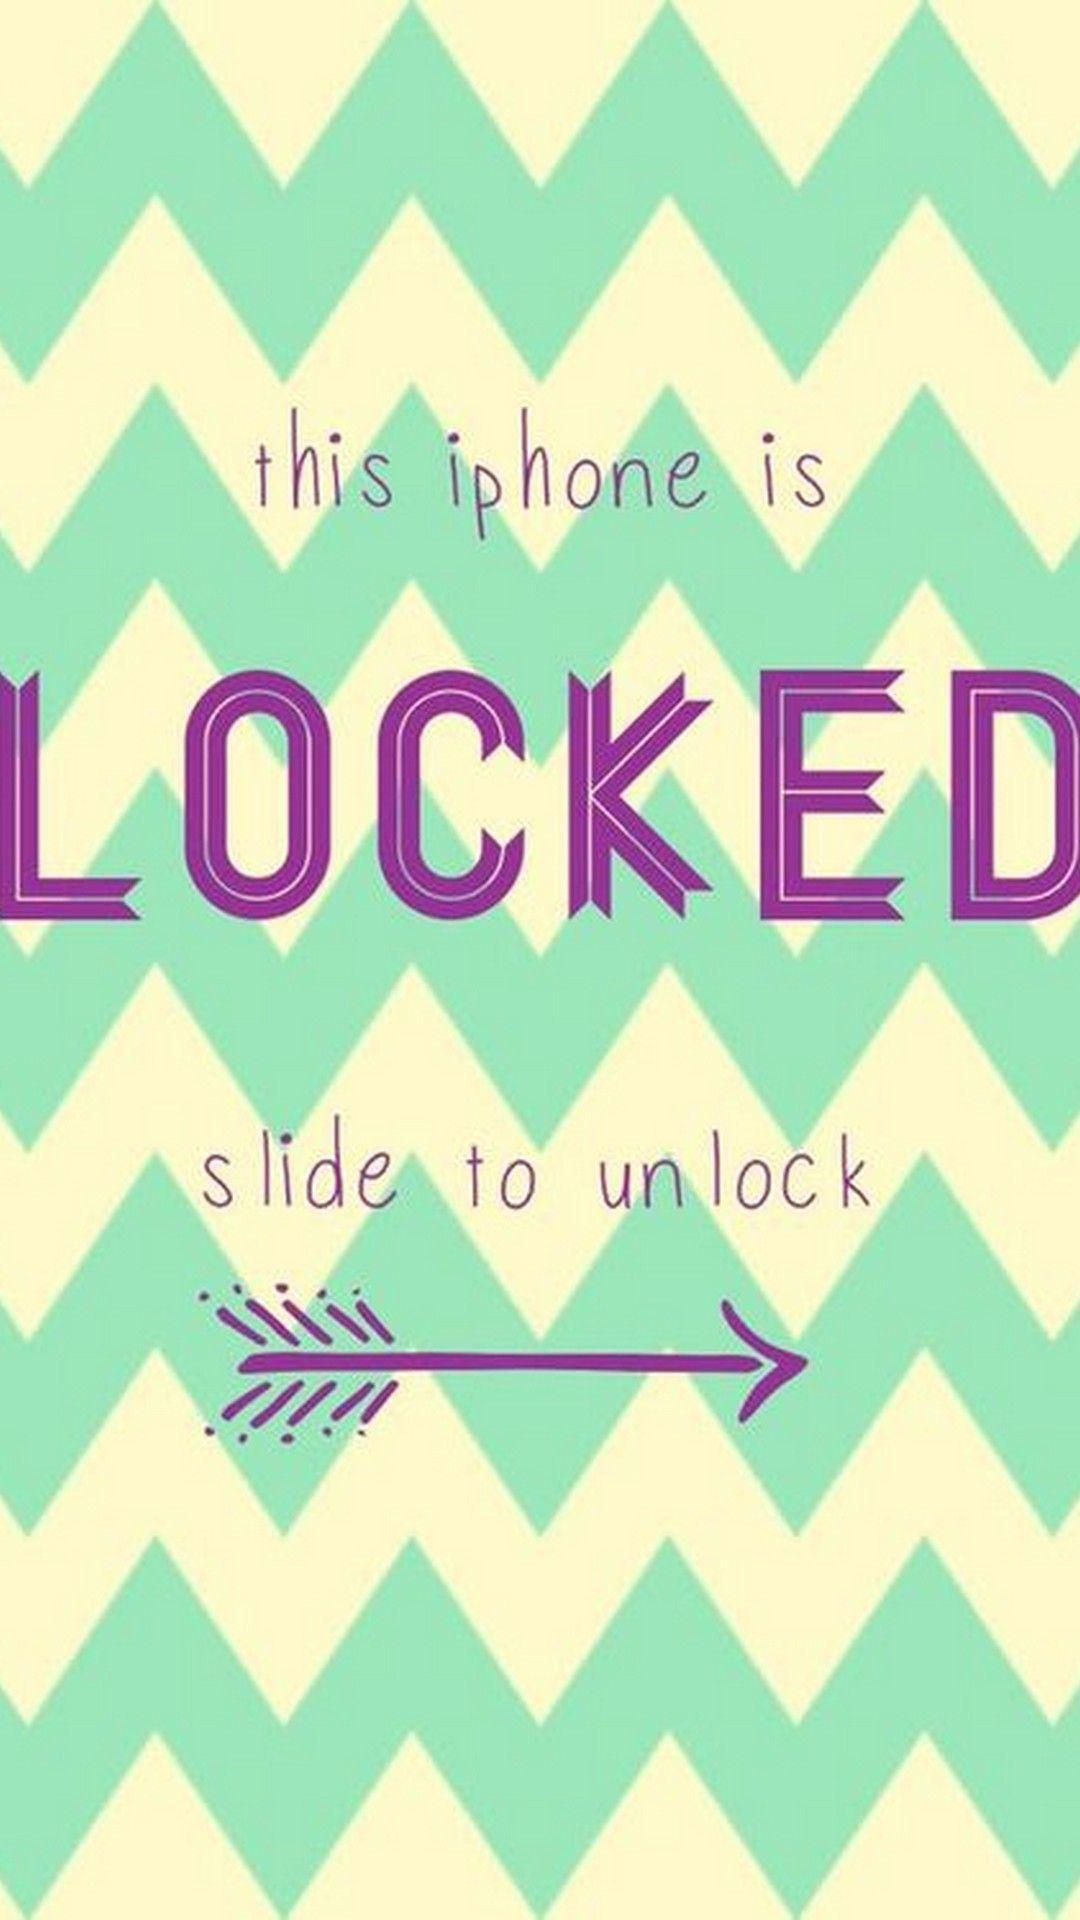 Cute Iphone Lock Screen Wallpapers Top Free Cute Iphone Lock Screen Backgrounds Wallpaperaccess